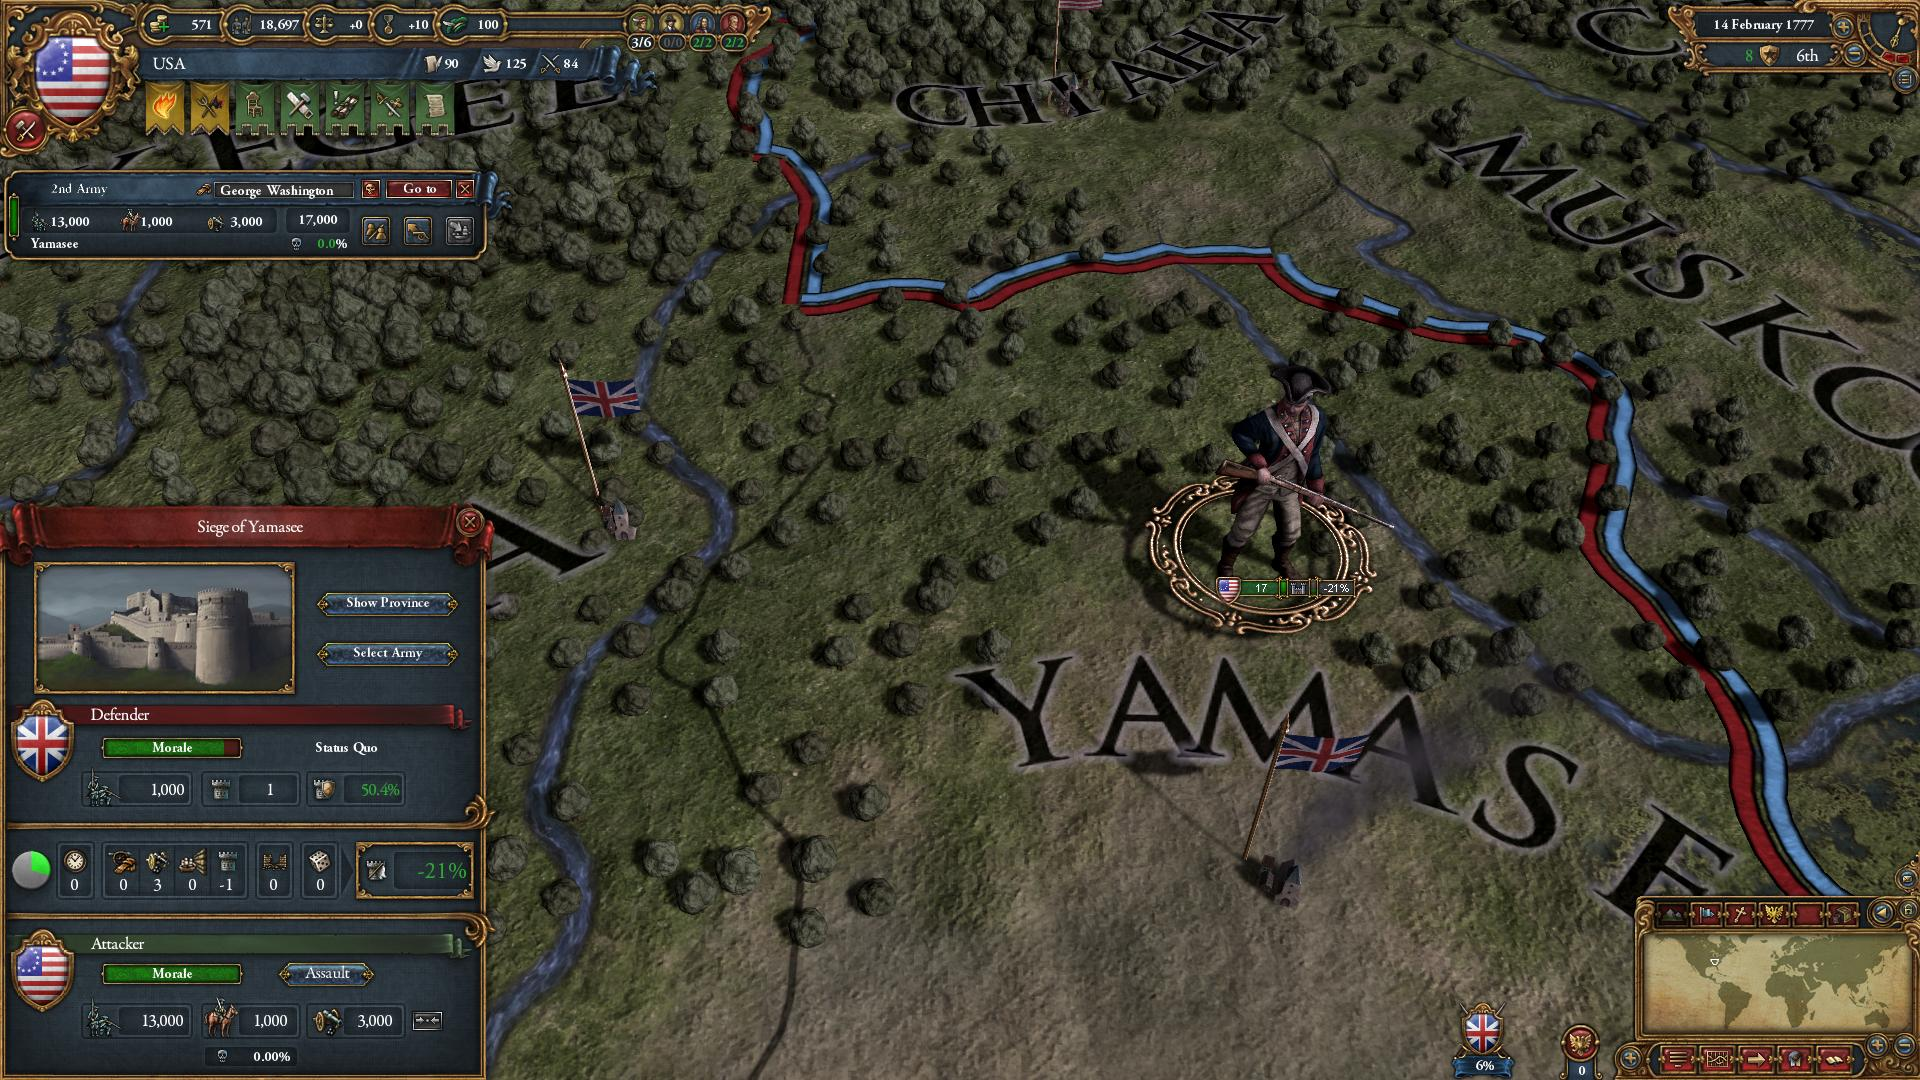 Europa Universalis IV: American Dream game image